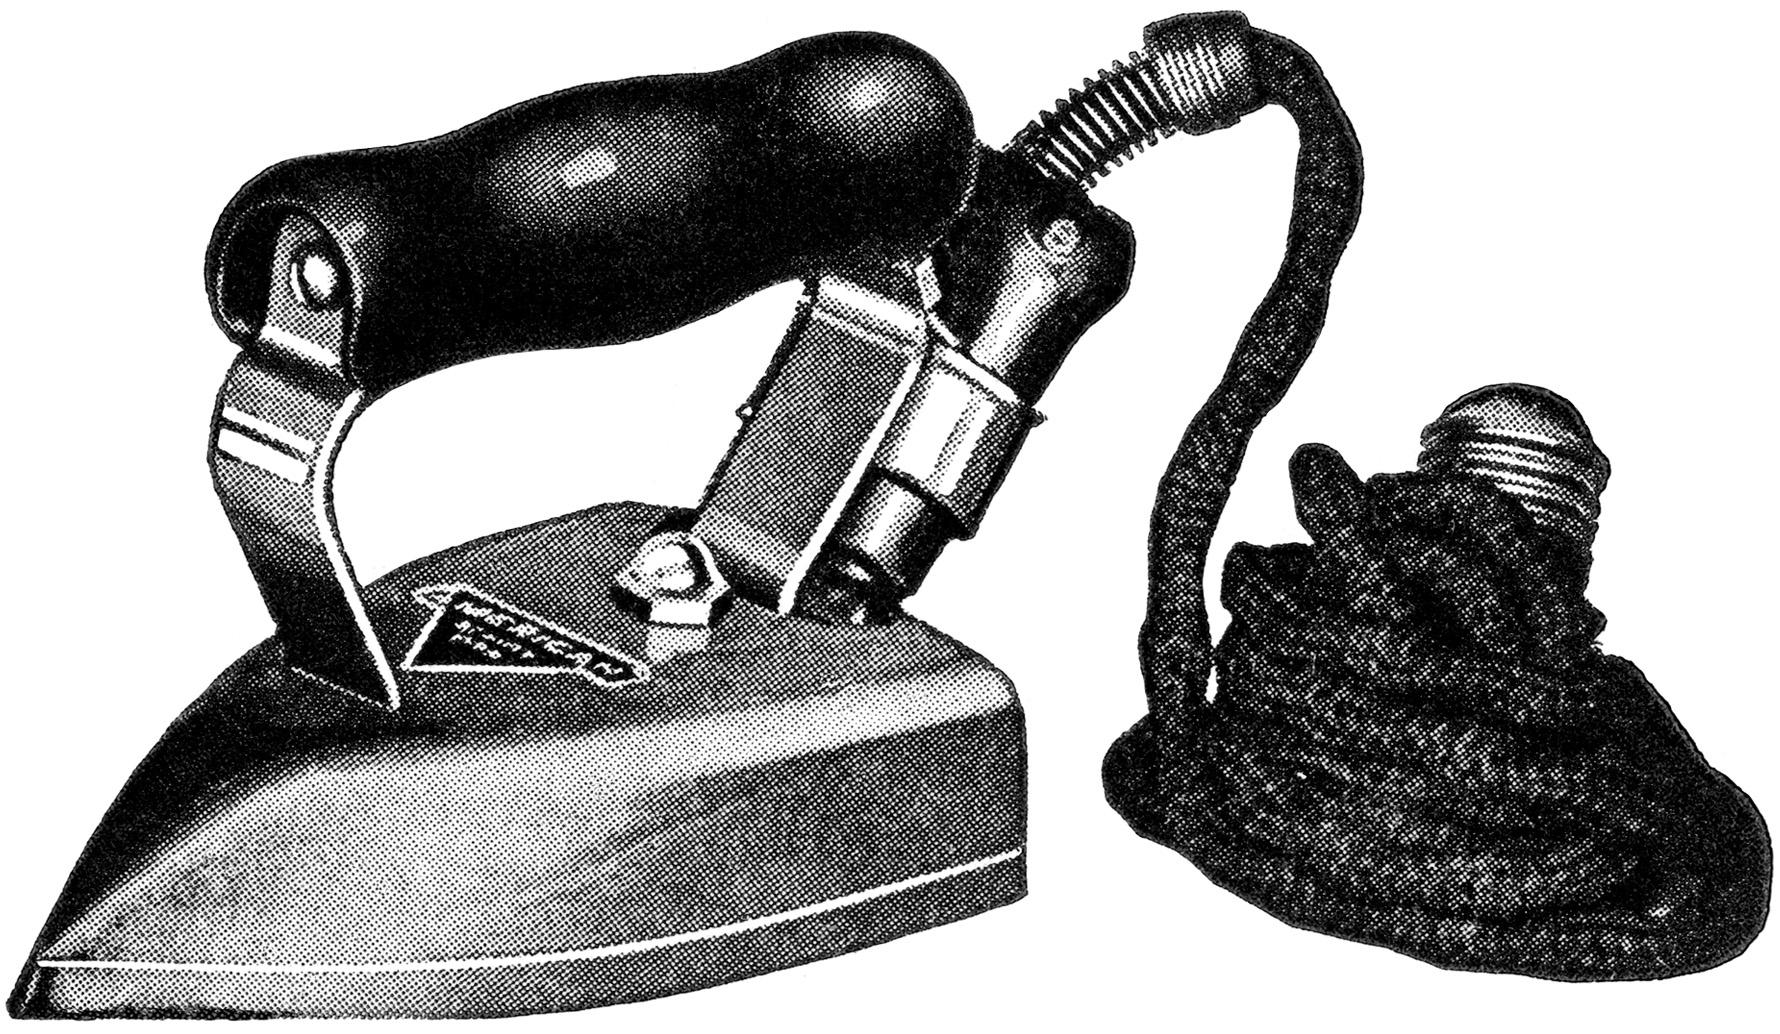 Antique Clothes Iron Clipart.